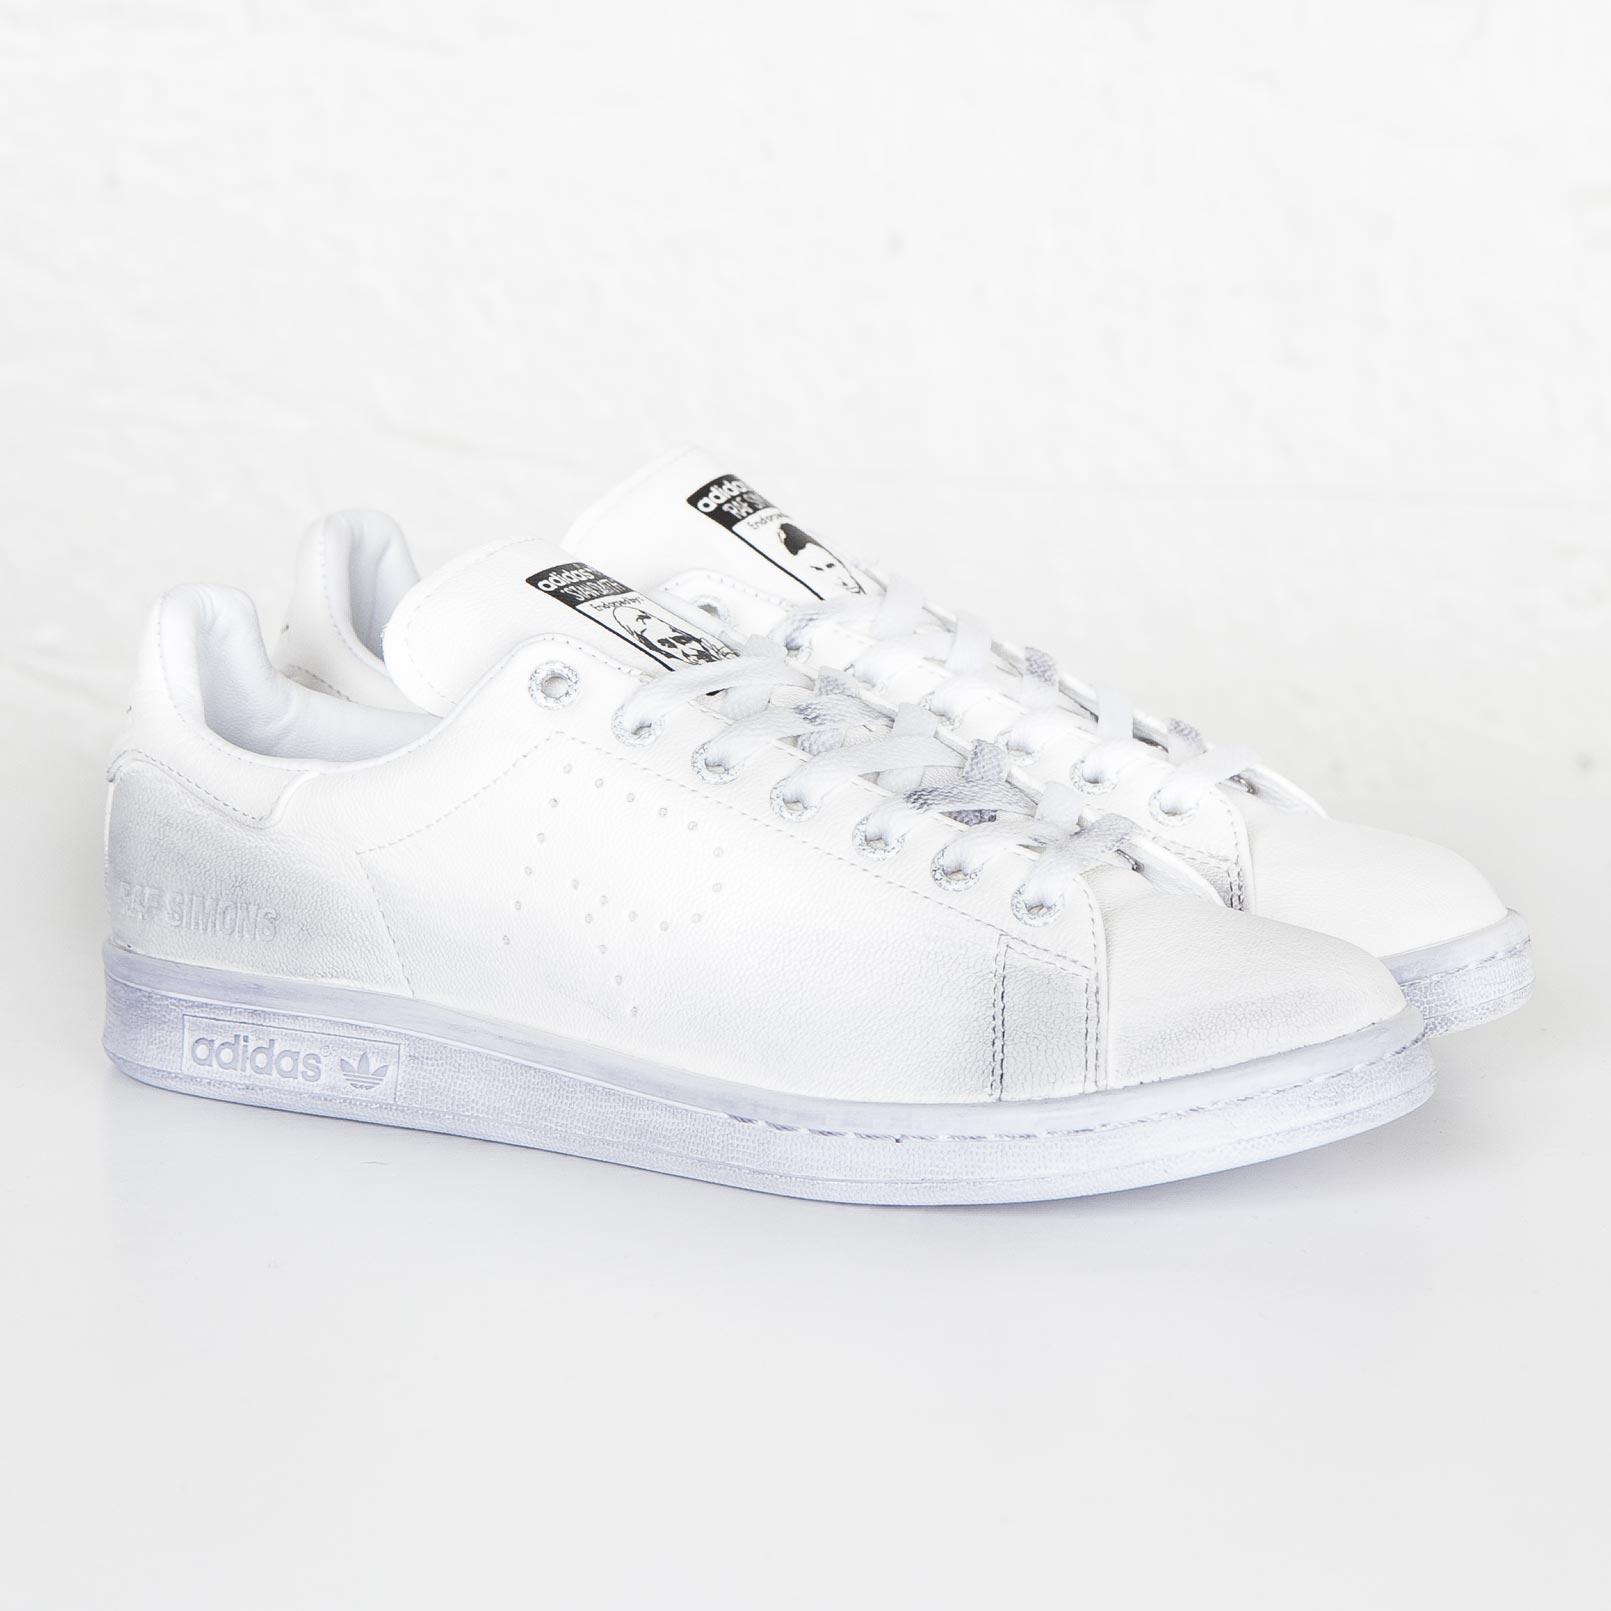 Adidas Stan Smith de s74619 sneakersnstuff Raf Simons